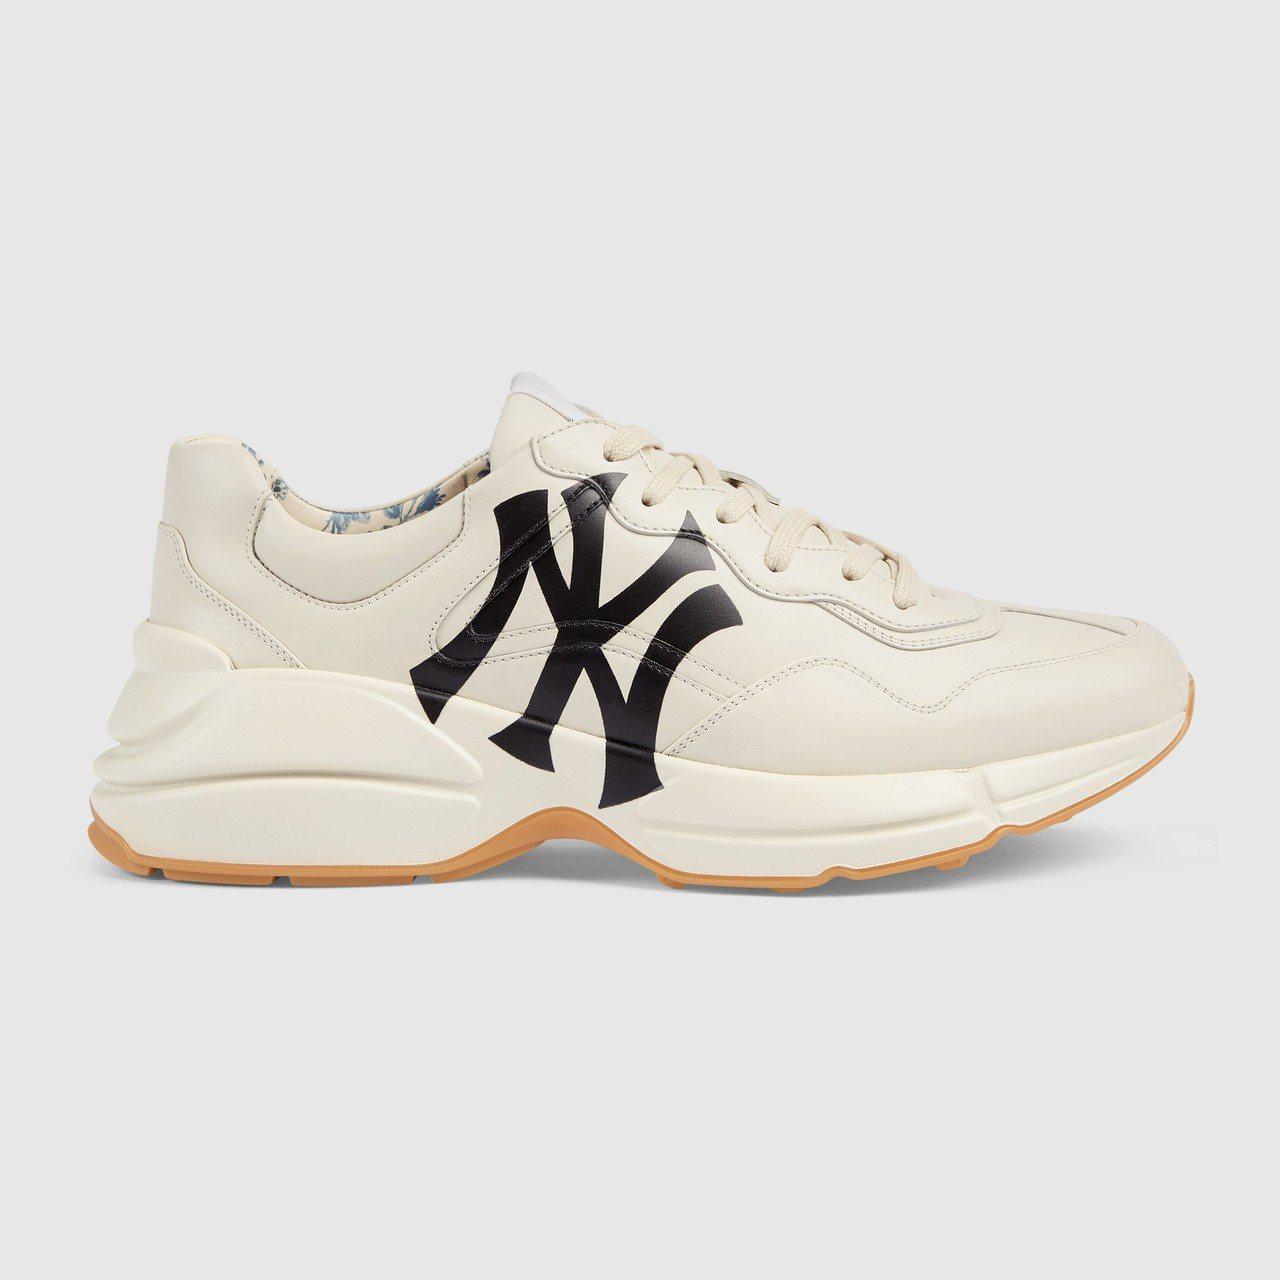 NY Yankees™紐約洋基隊貼飾Rhyton球鞋,34,300元。圖/Guc...